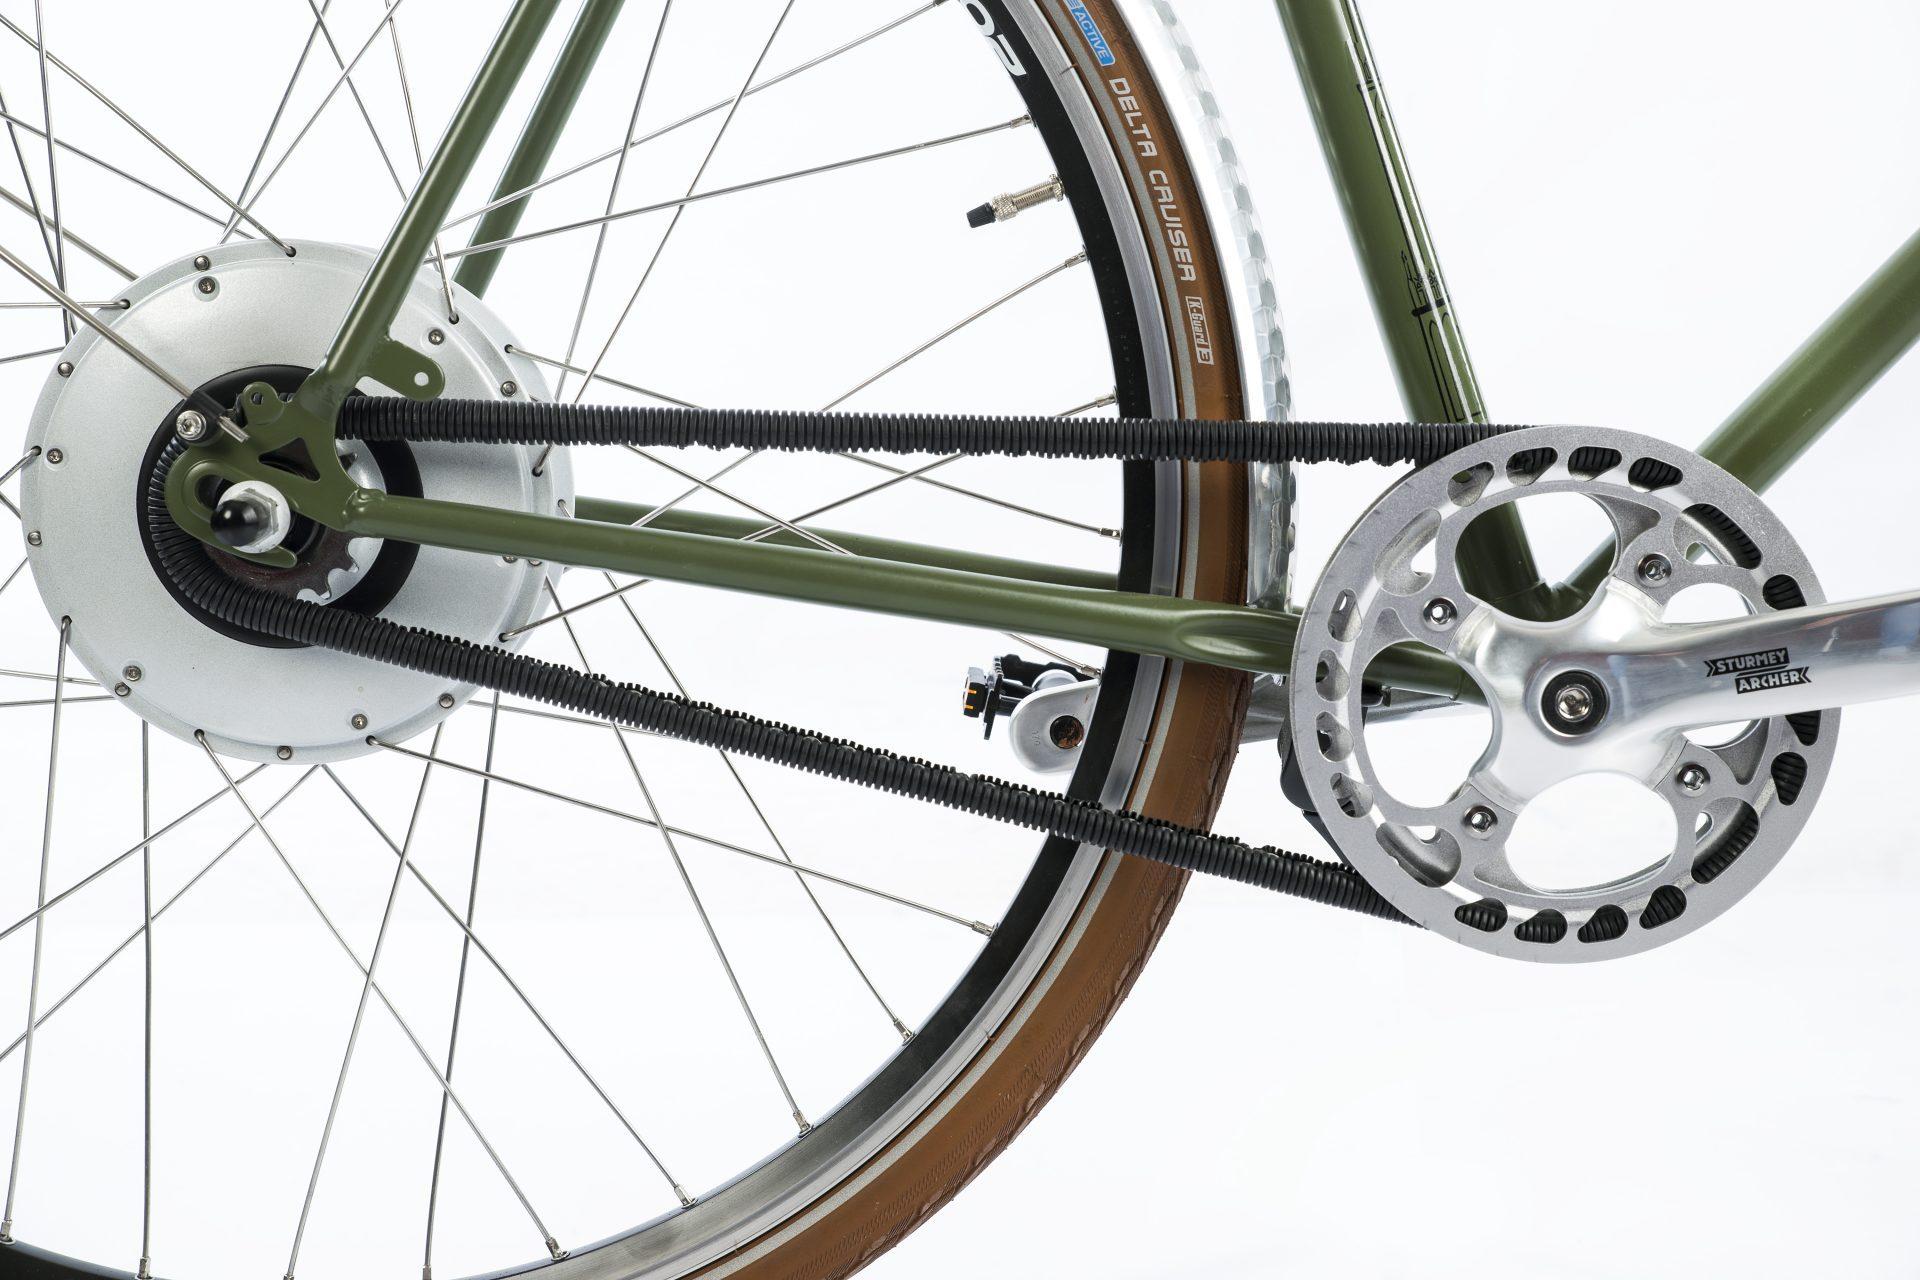 Zehus human + electric hub | design your own e-bike